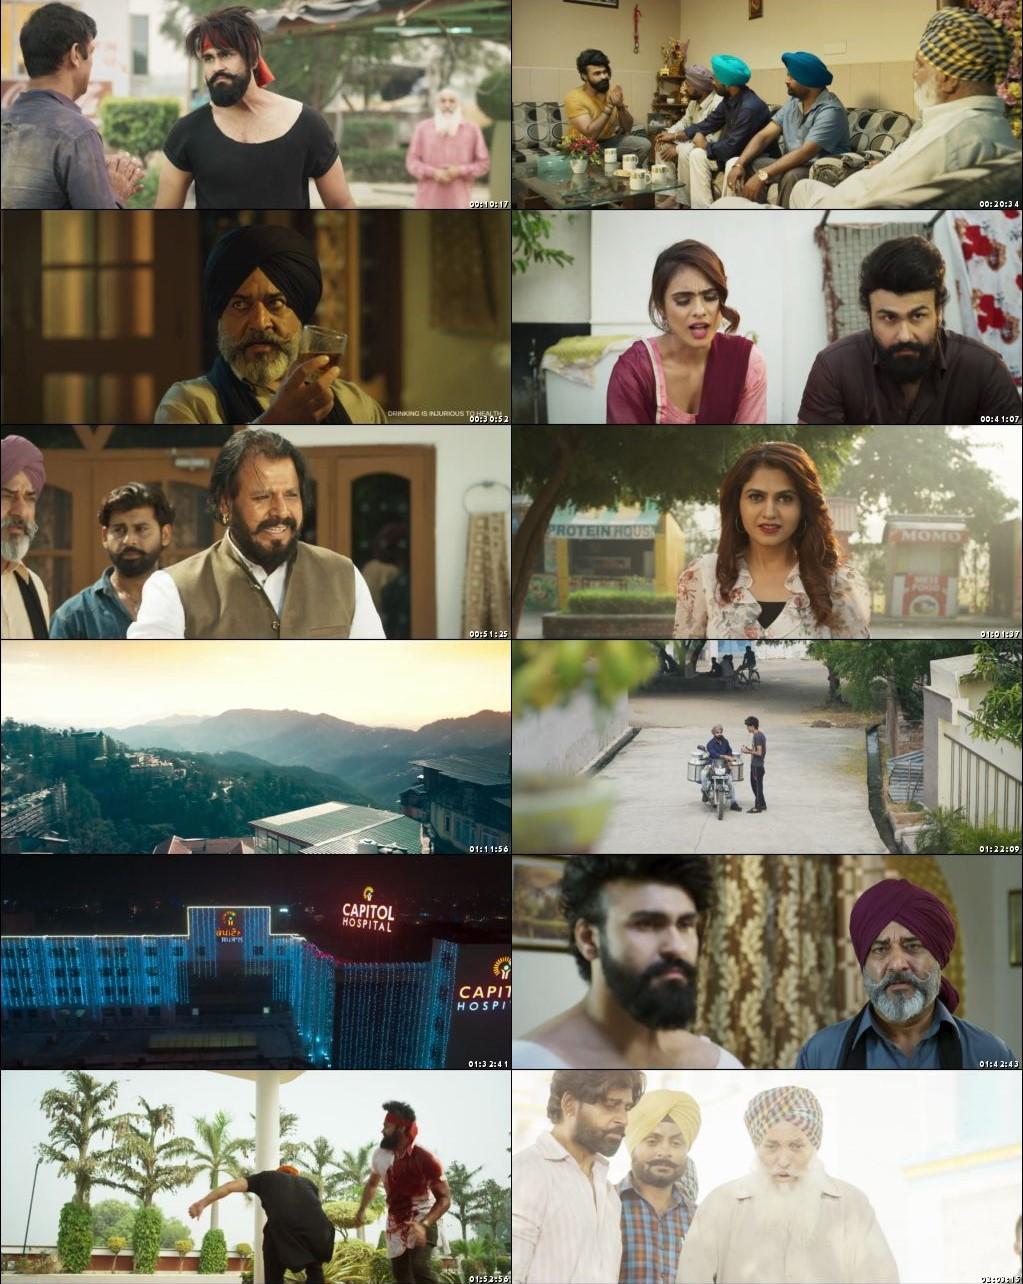 Gandhi Fer Aa Gea 2020 Full Punjabi Movie Online Watch